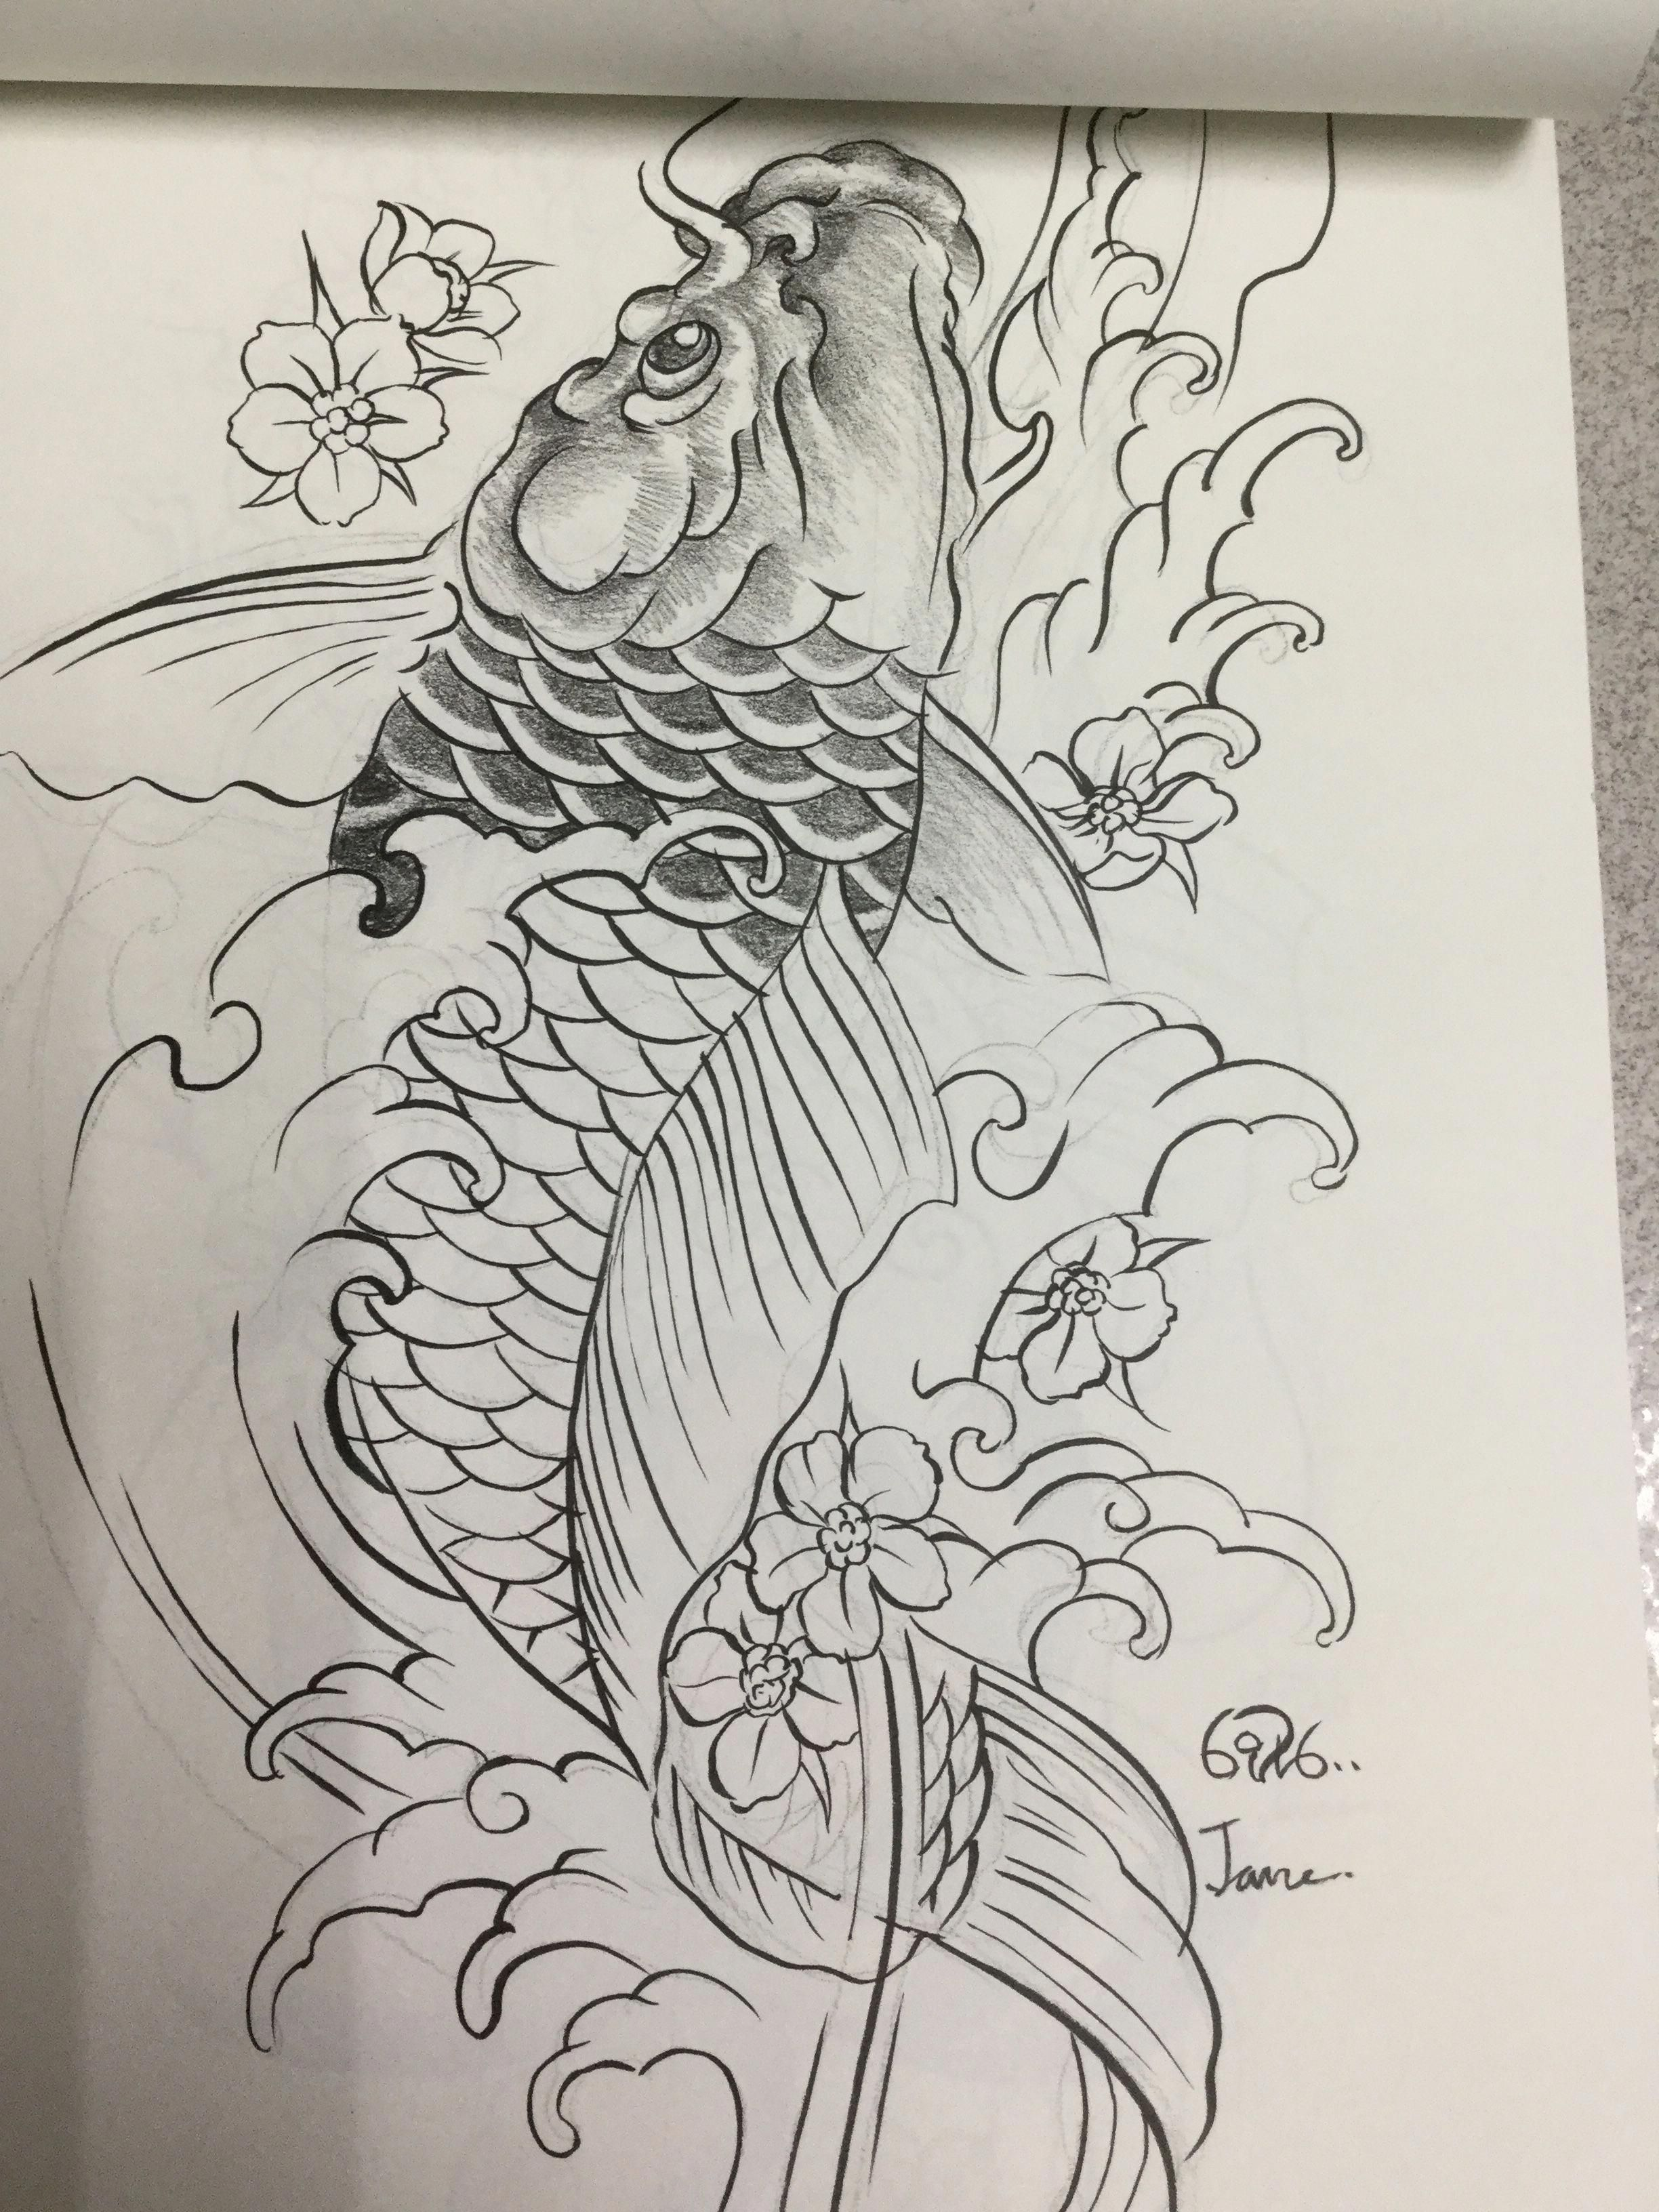 Japanesekoidragontattoo Koi Dragon Tattoo Japanese Koi Fish Tattoo Koi Tattoo Design